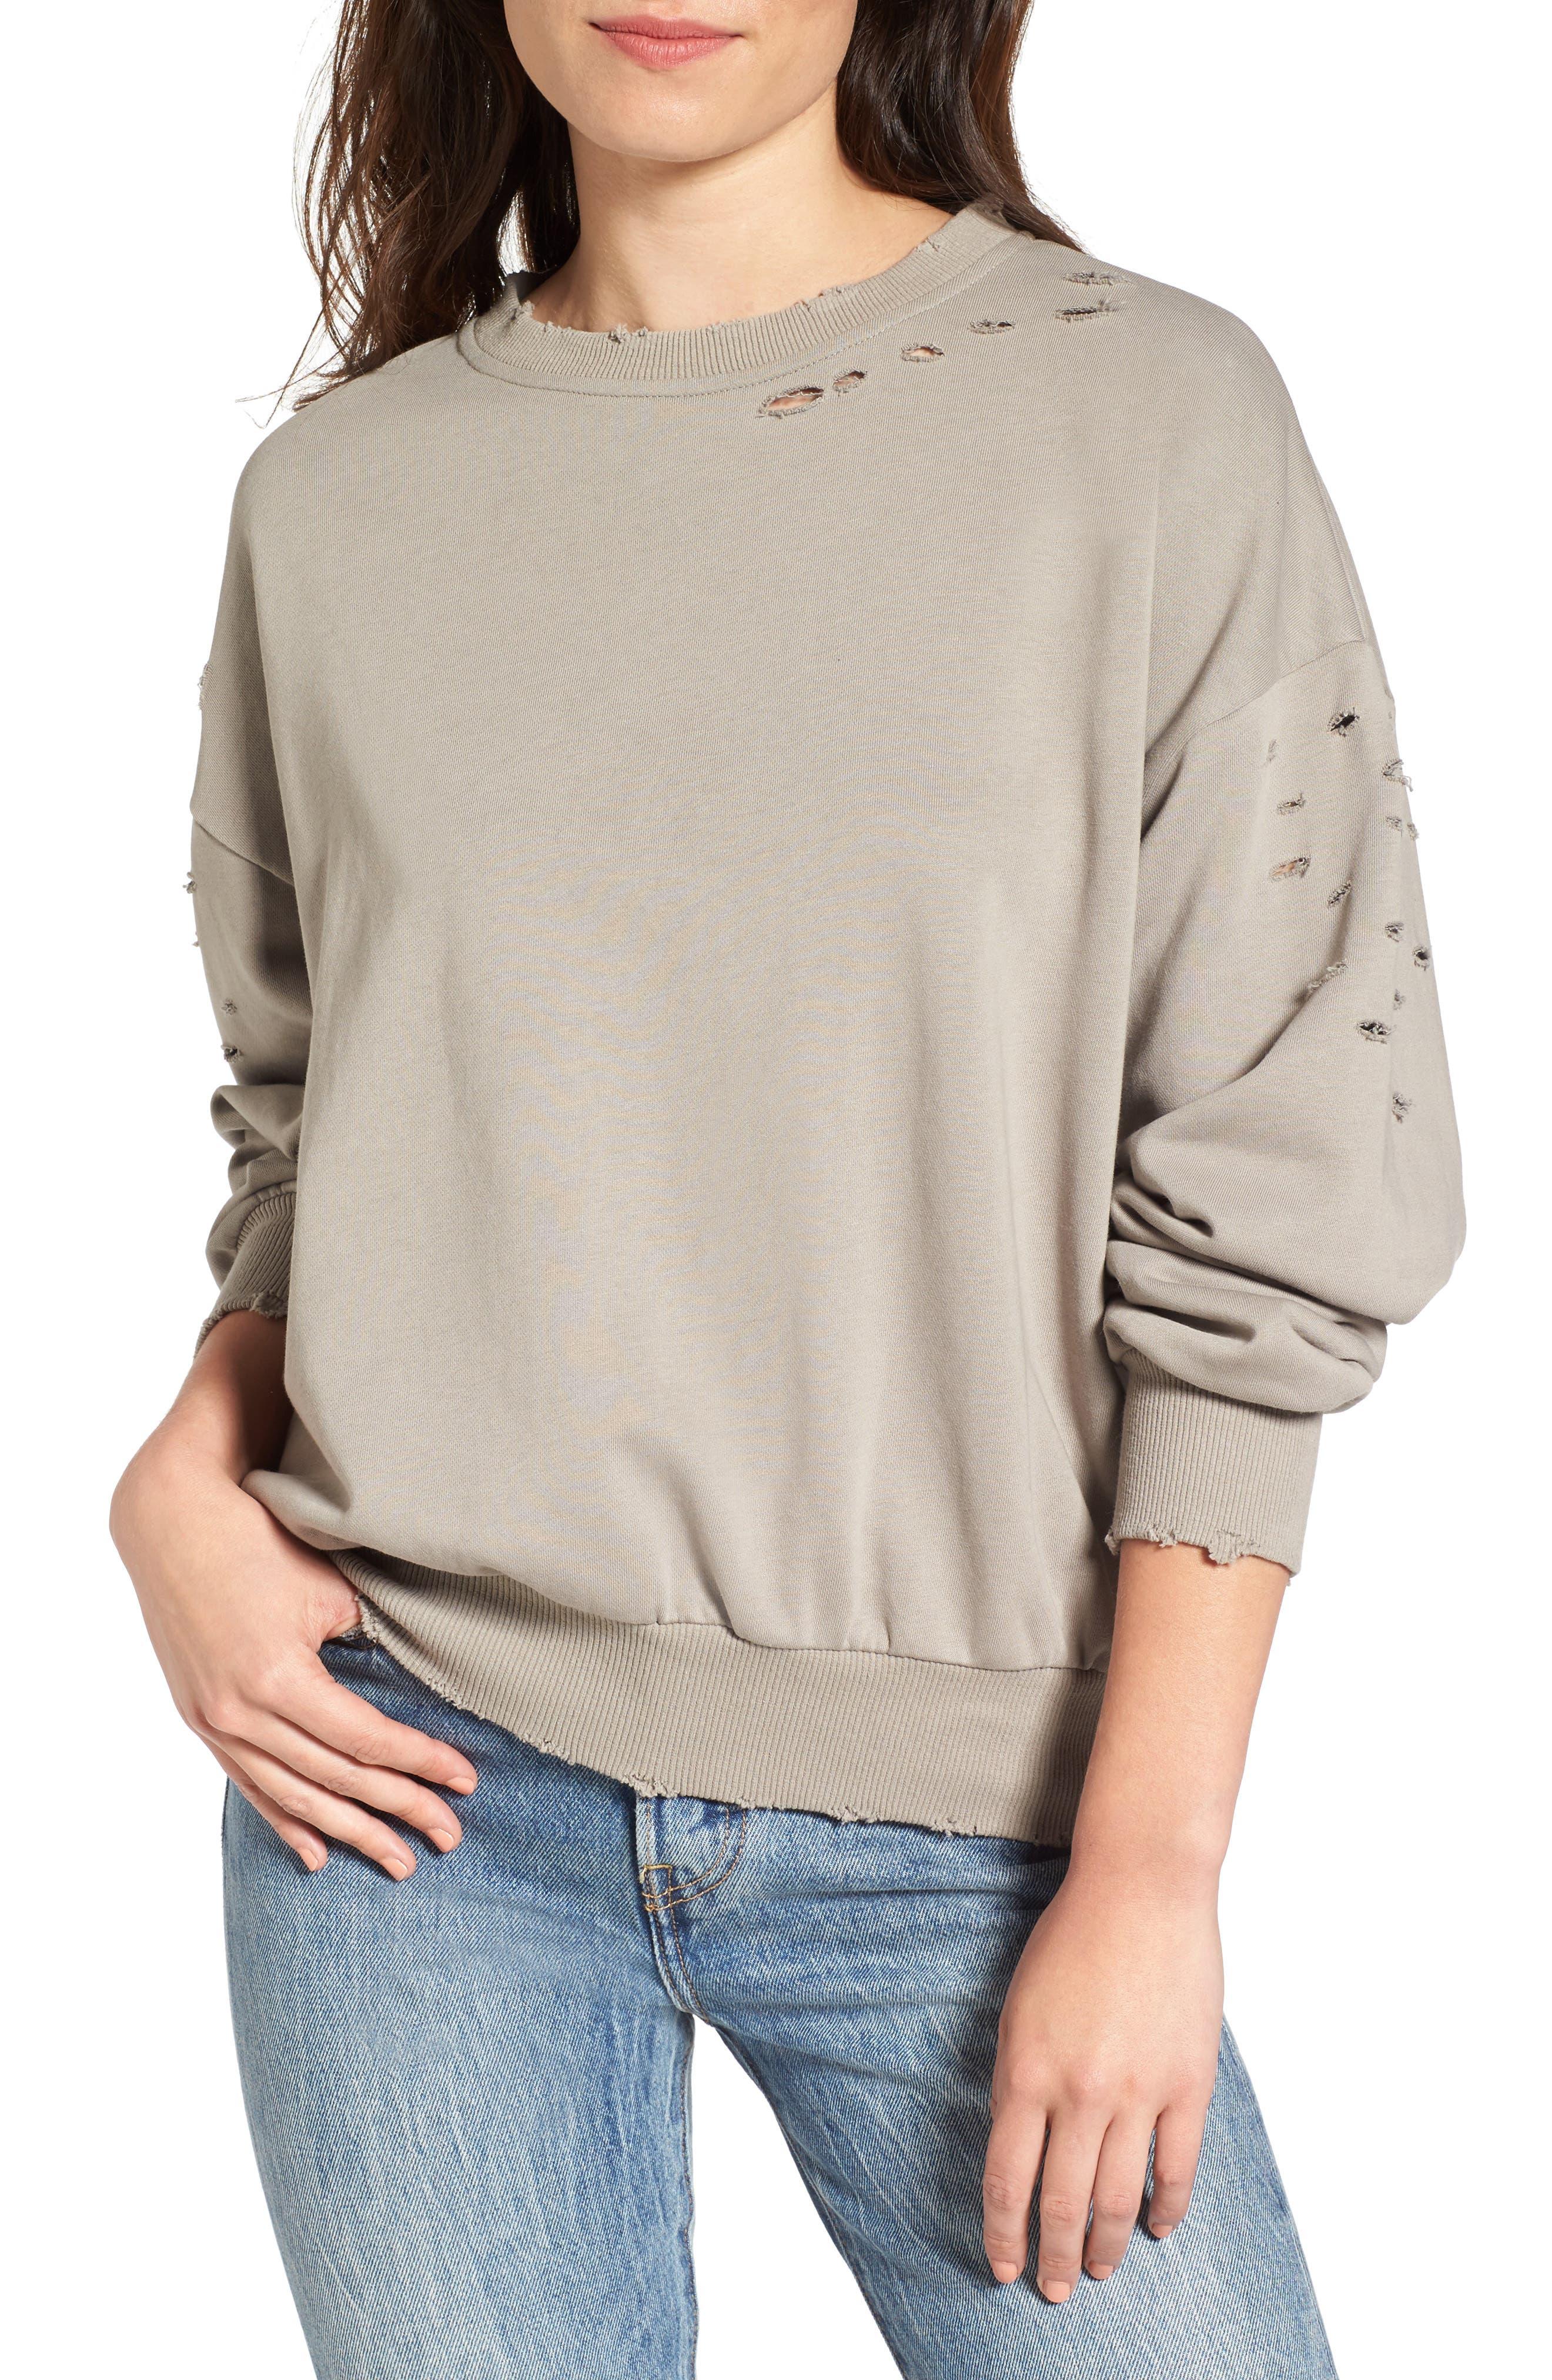 Soprano Holey Sweatshirt